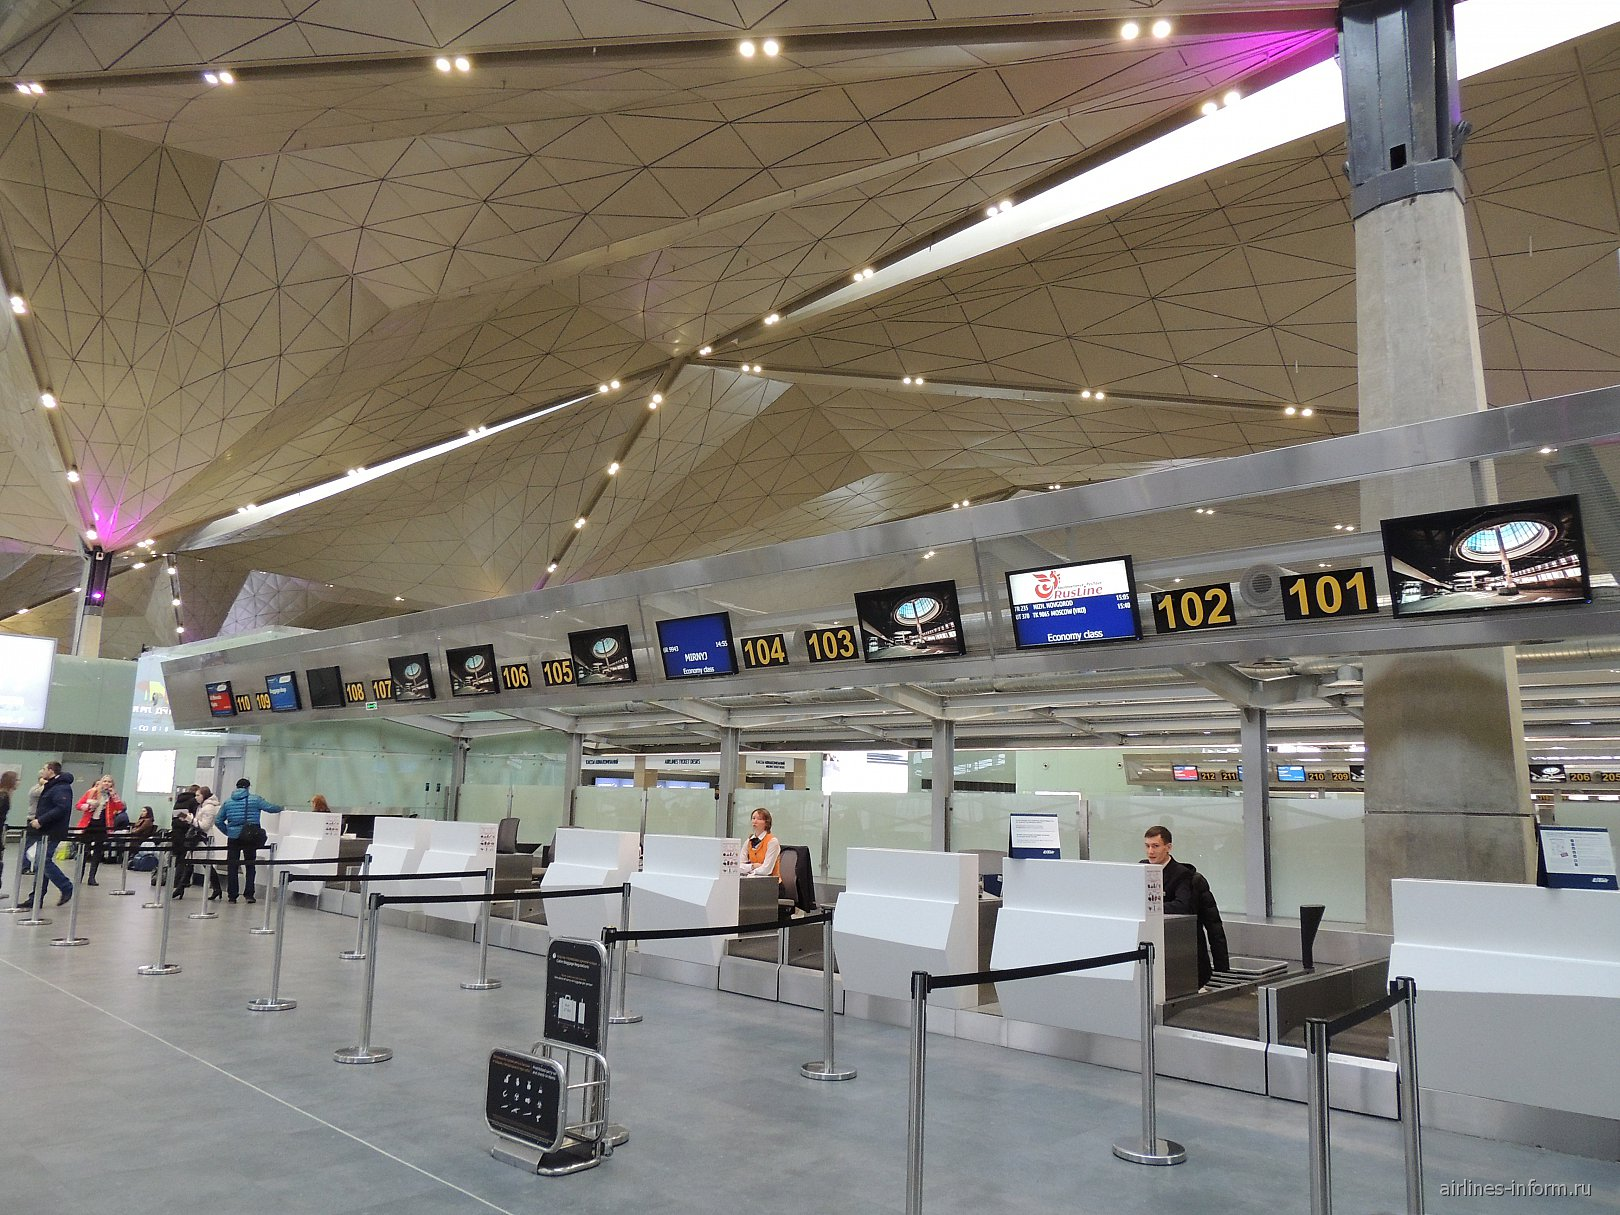 Стойки регистрации в аэропорту Санкт-Петербург Пулково